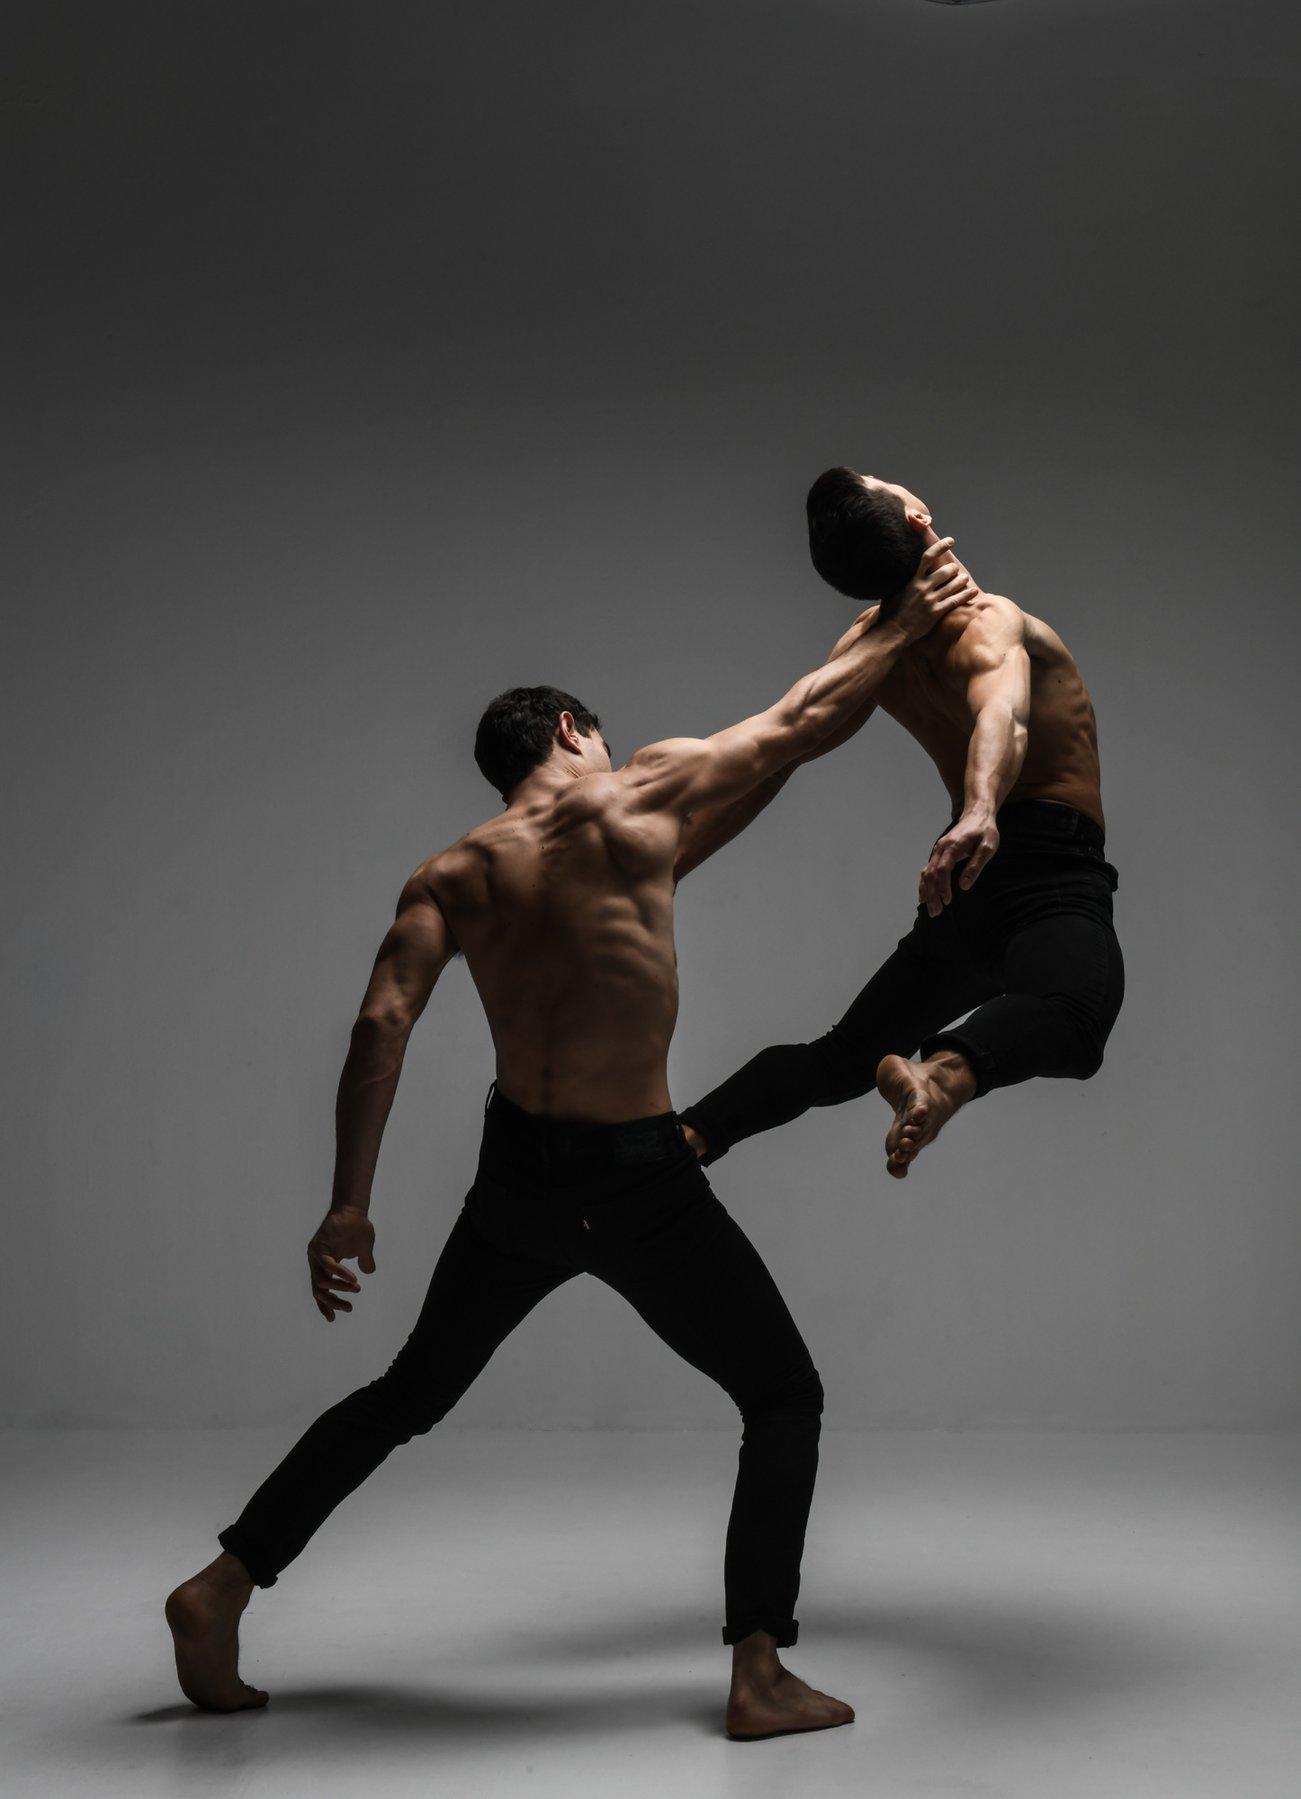 Danse @Julien Benhamou